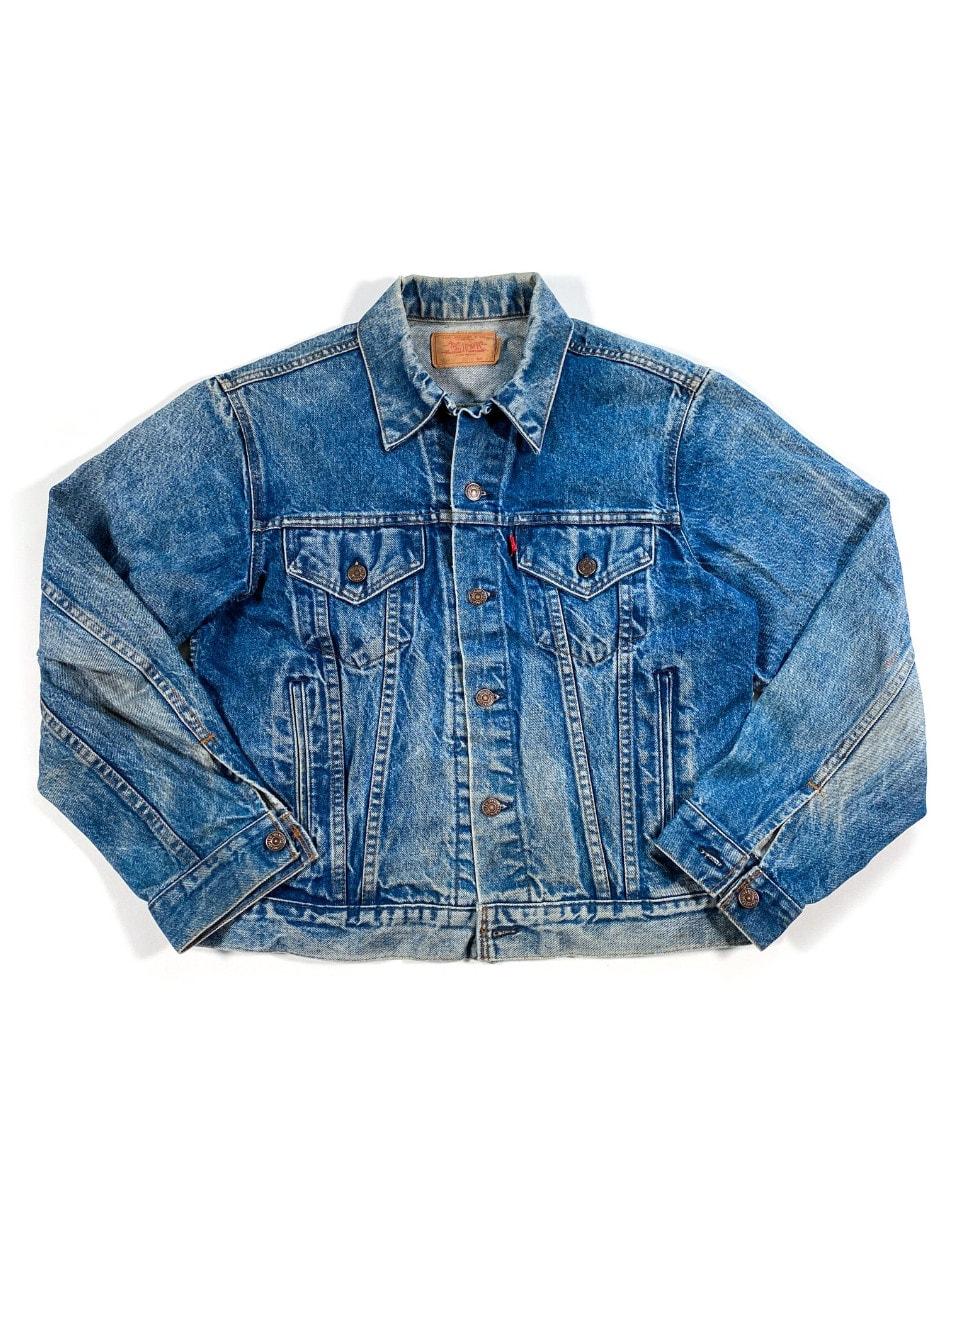 Vintage Levis denim jacket 80s levis jacket vintage levis jean jacket blue levis jacket levis cowboy jacket levis western coat levi strauss